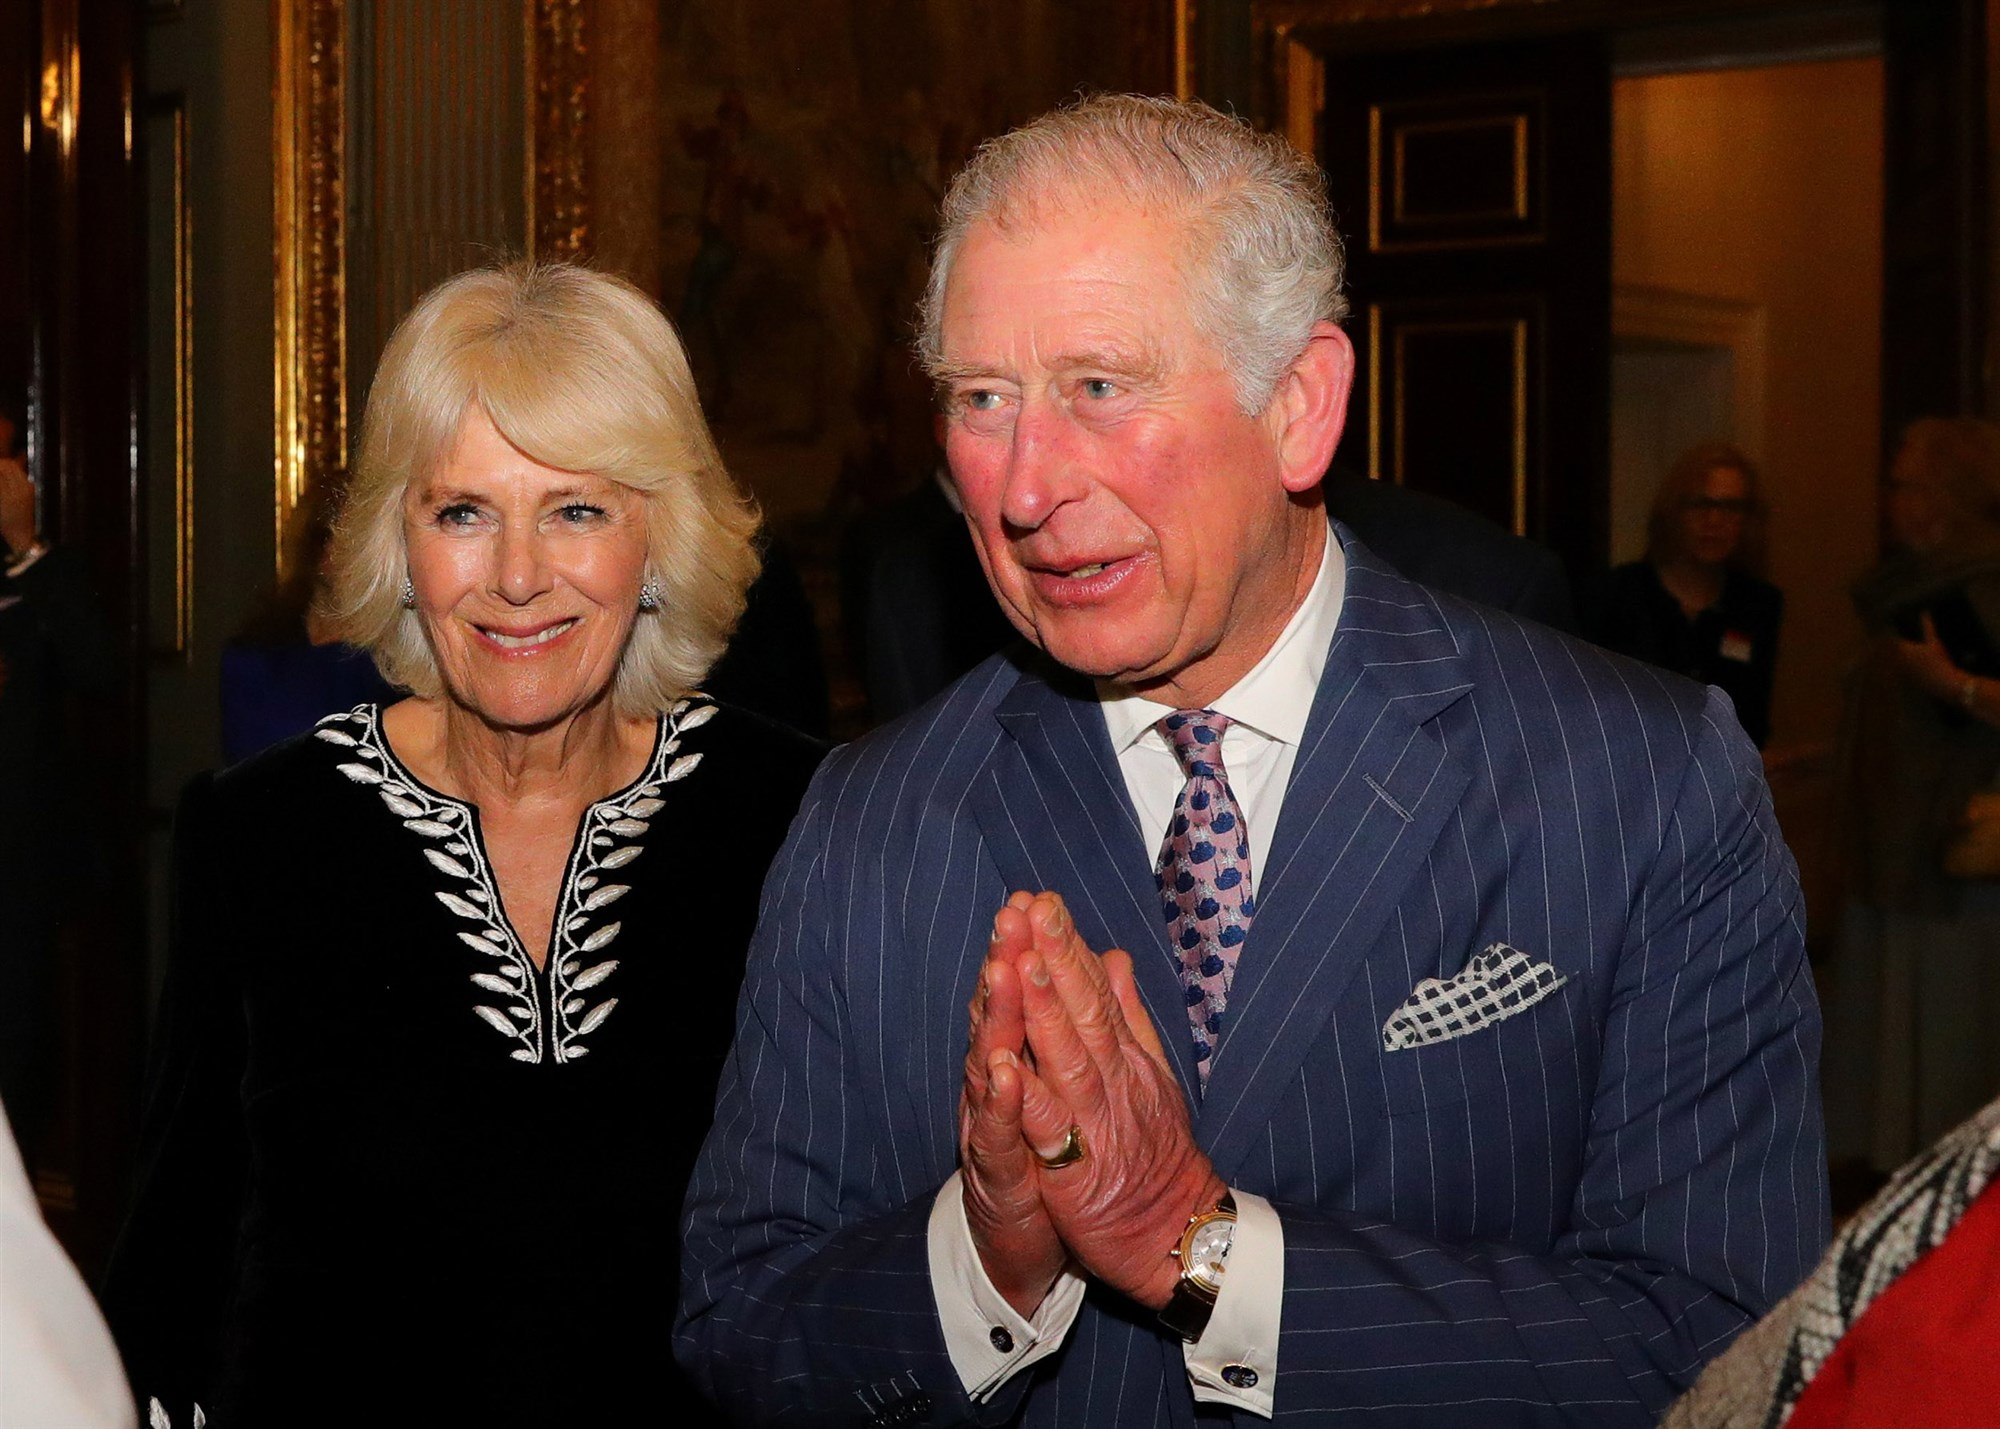 Princi i Uelsit Charles prekur me koronavirus